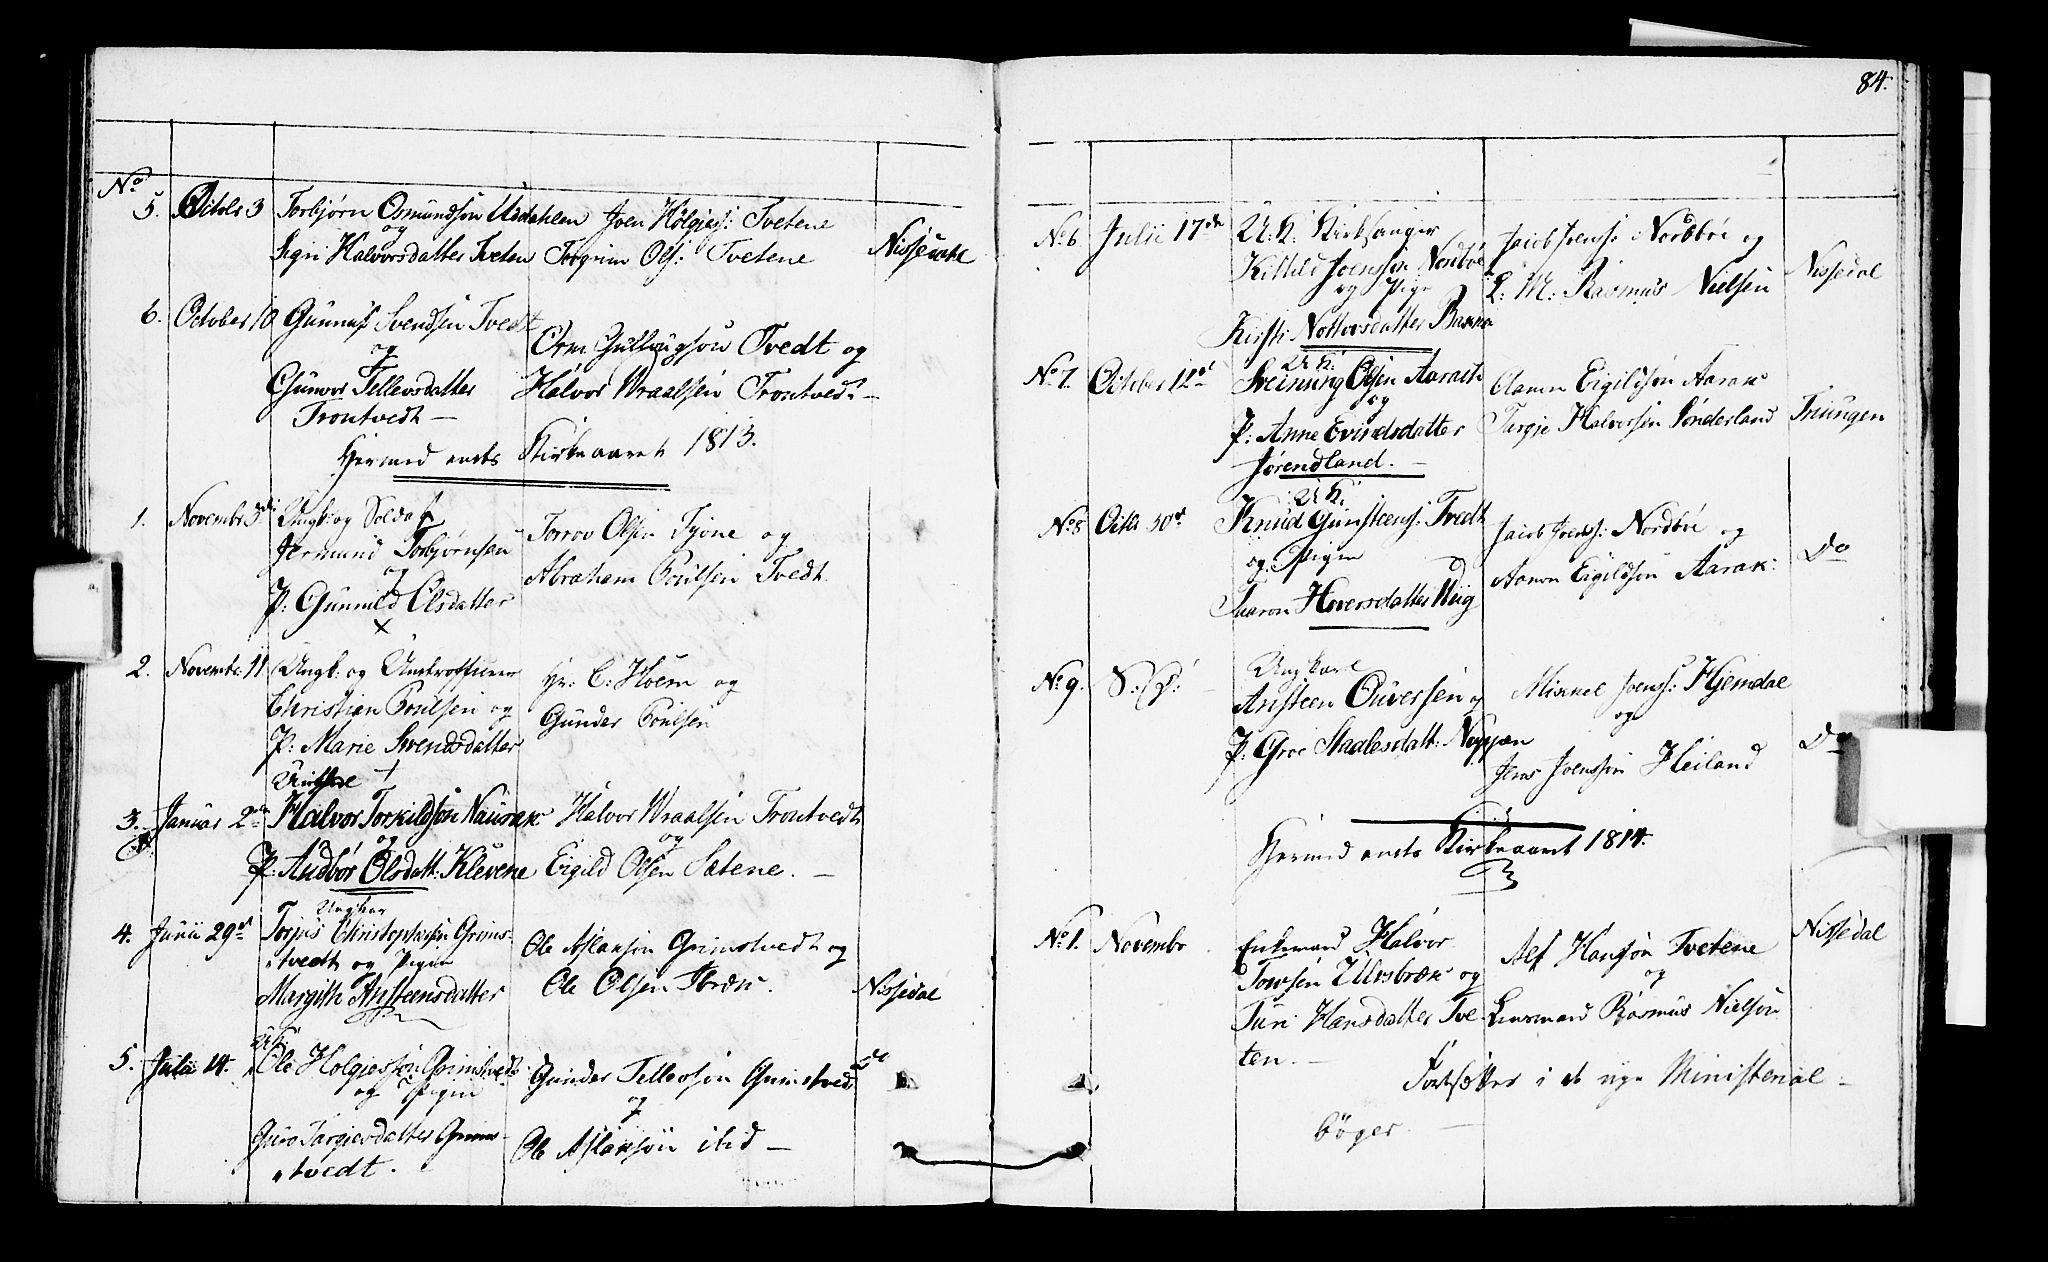 SAKO, Nissedal kirkebøker, F/Fa/L0001: Parish register (official) no. I 1, 1811-1814, p. 84